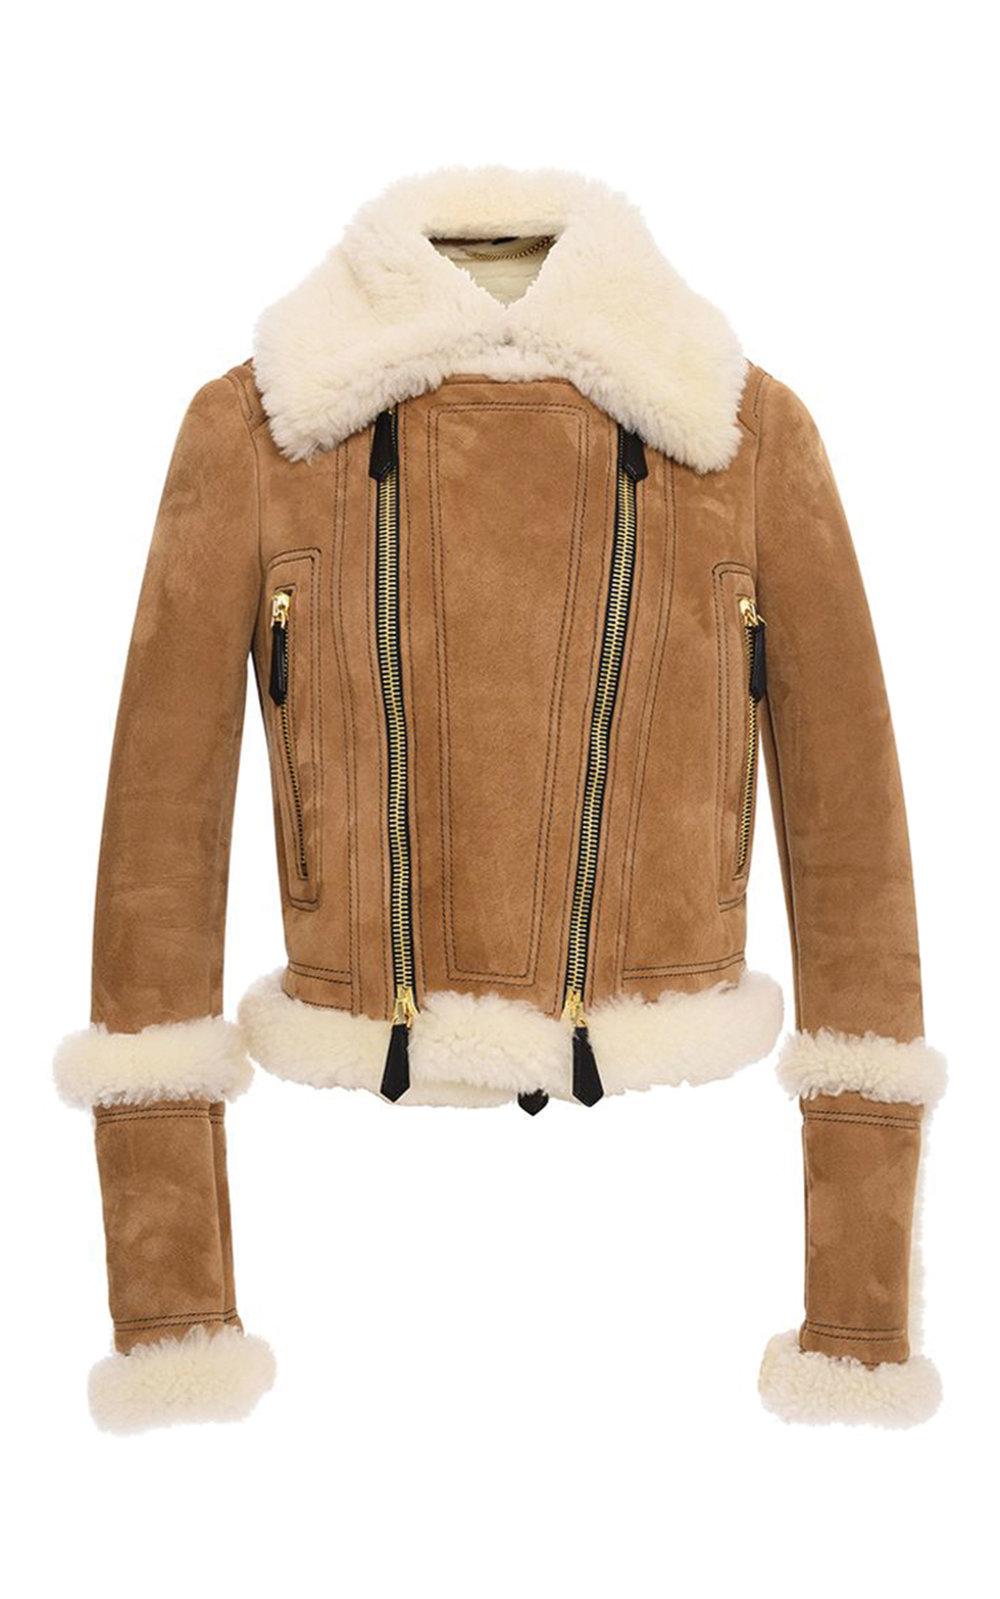 Burberry Shearling Biker Jacket $6,250